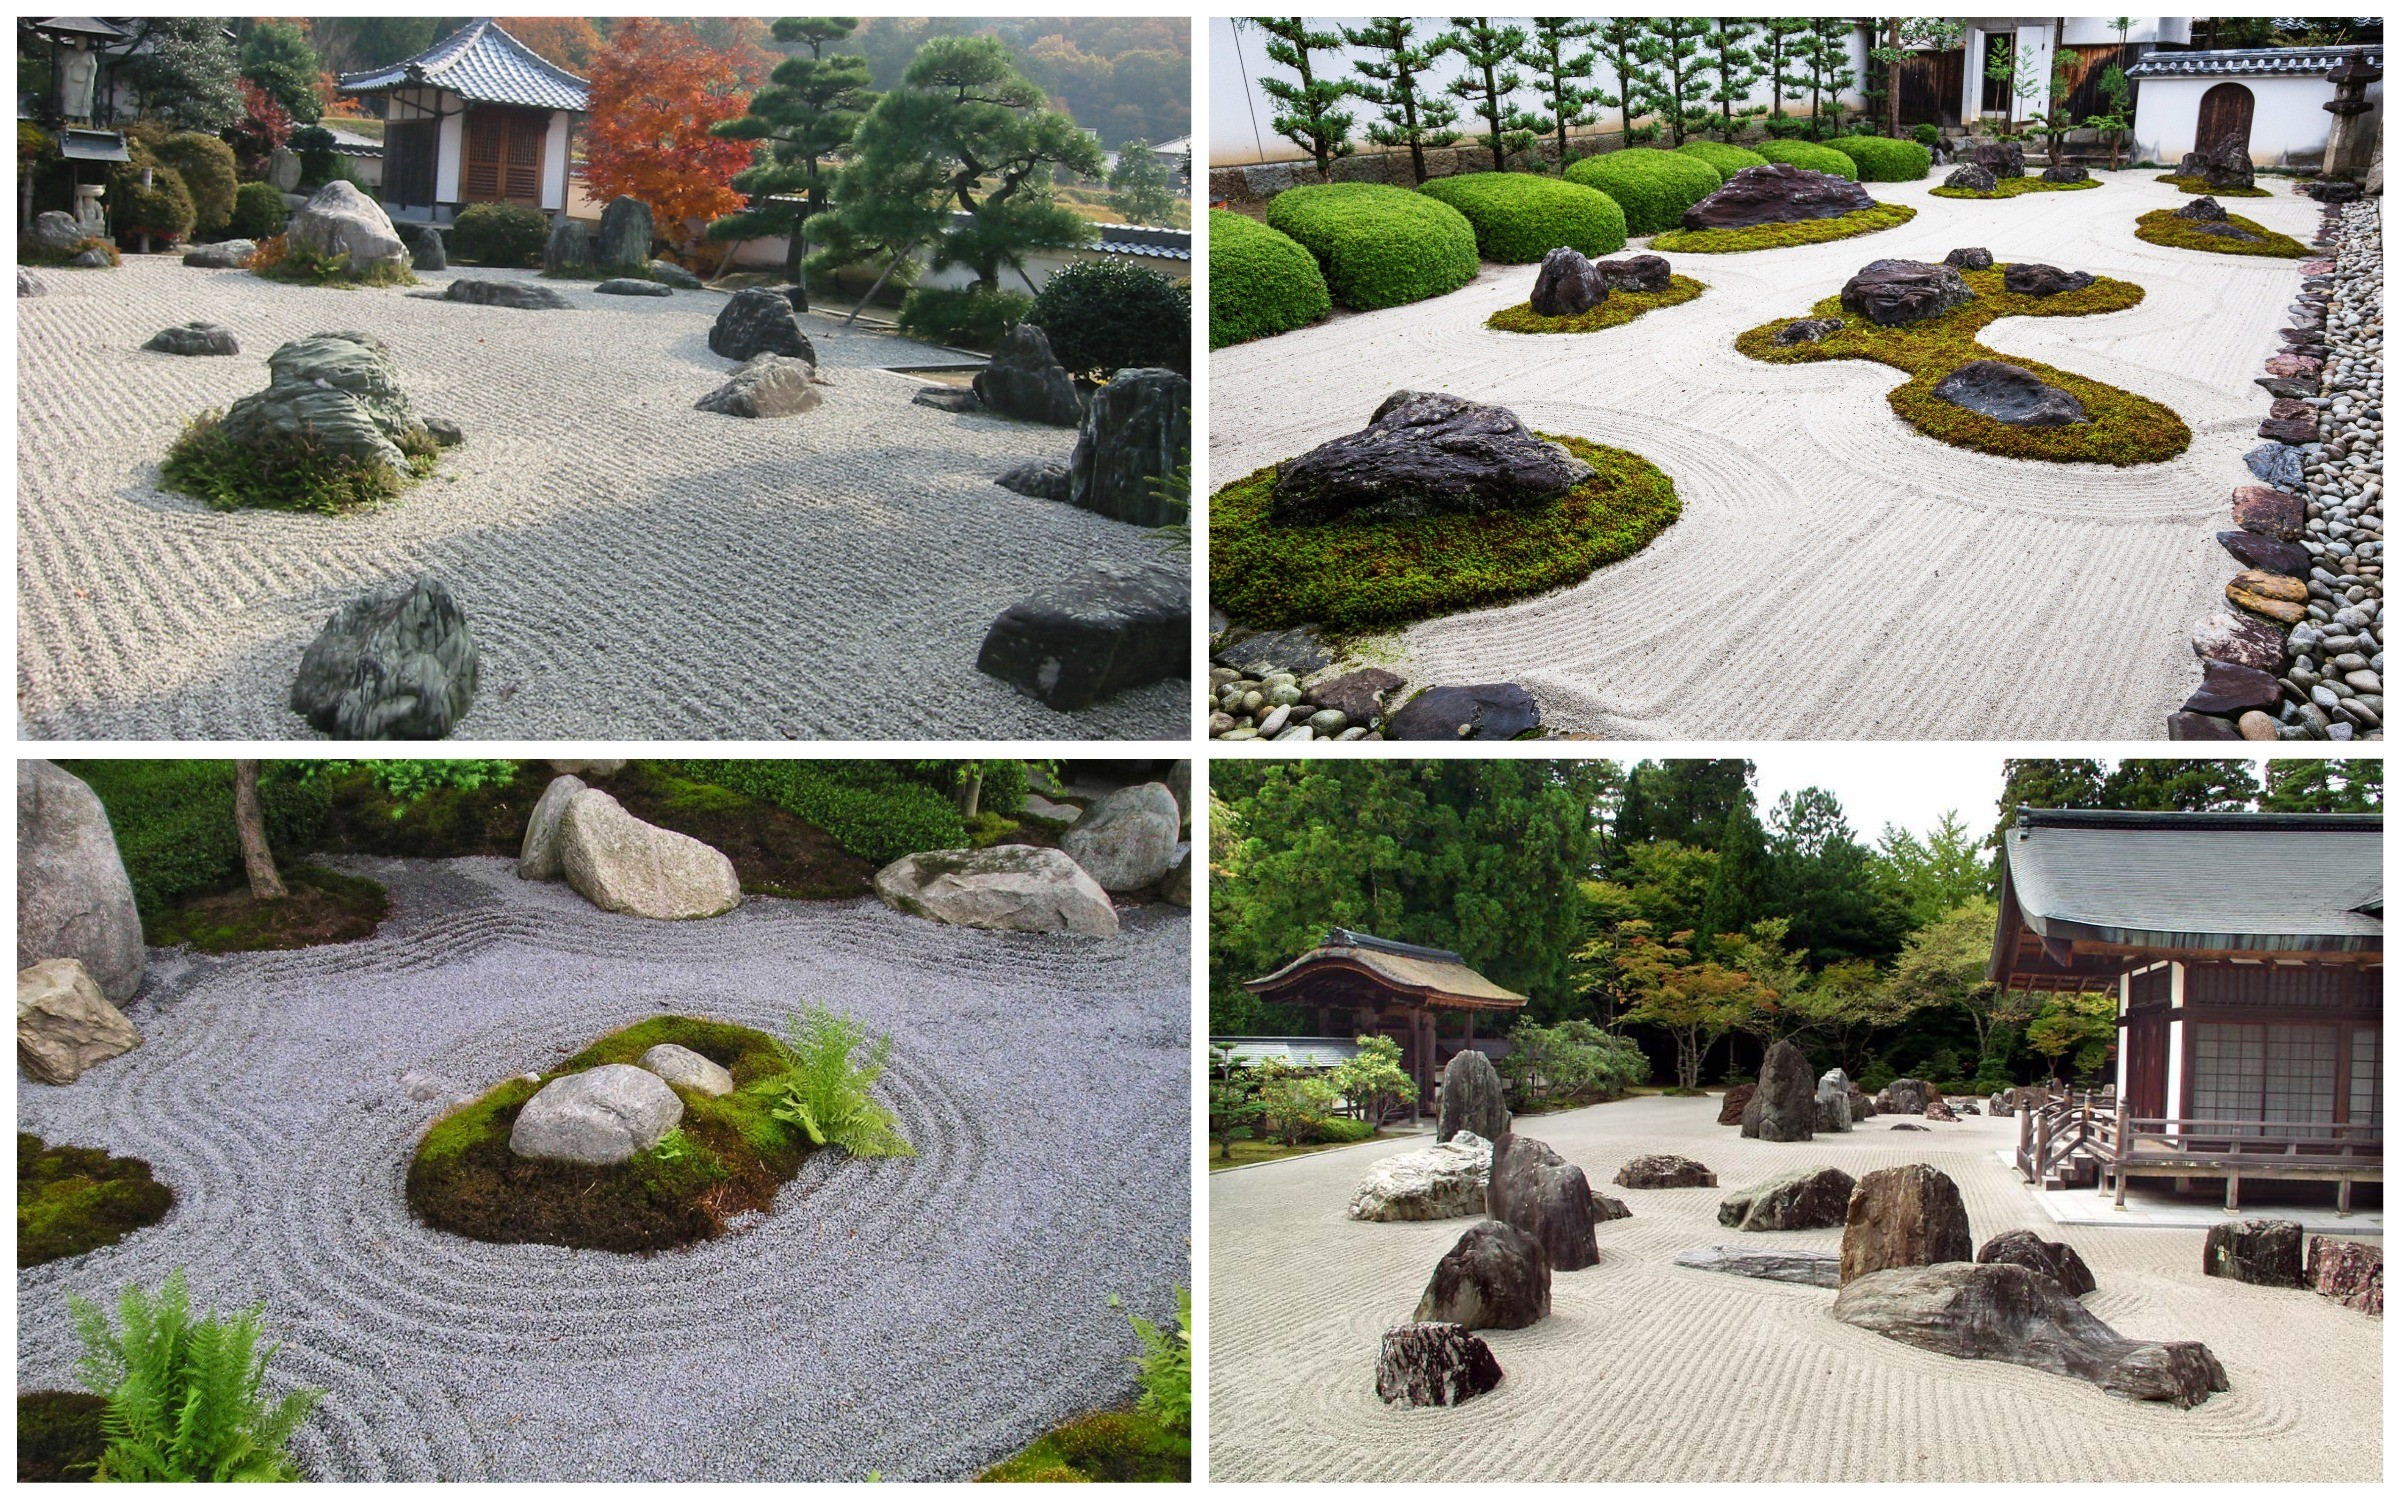 фото каменный японский сад